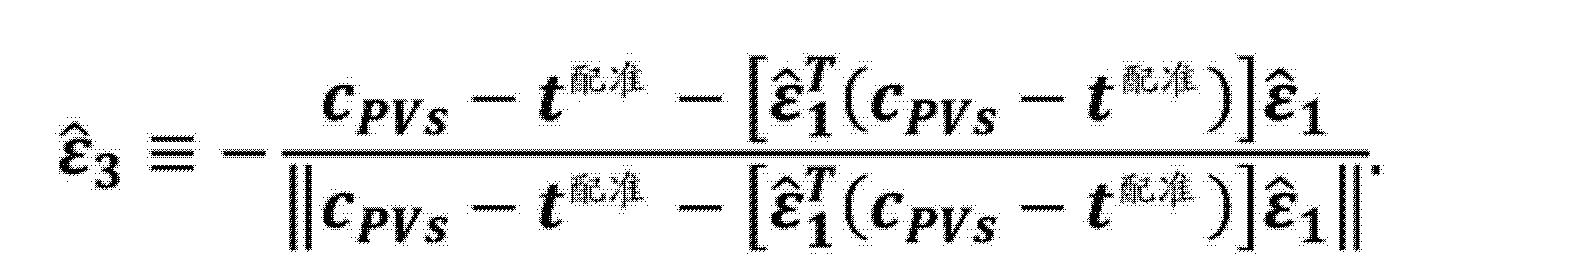 Figure CN104282036AD00262